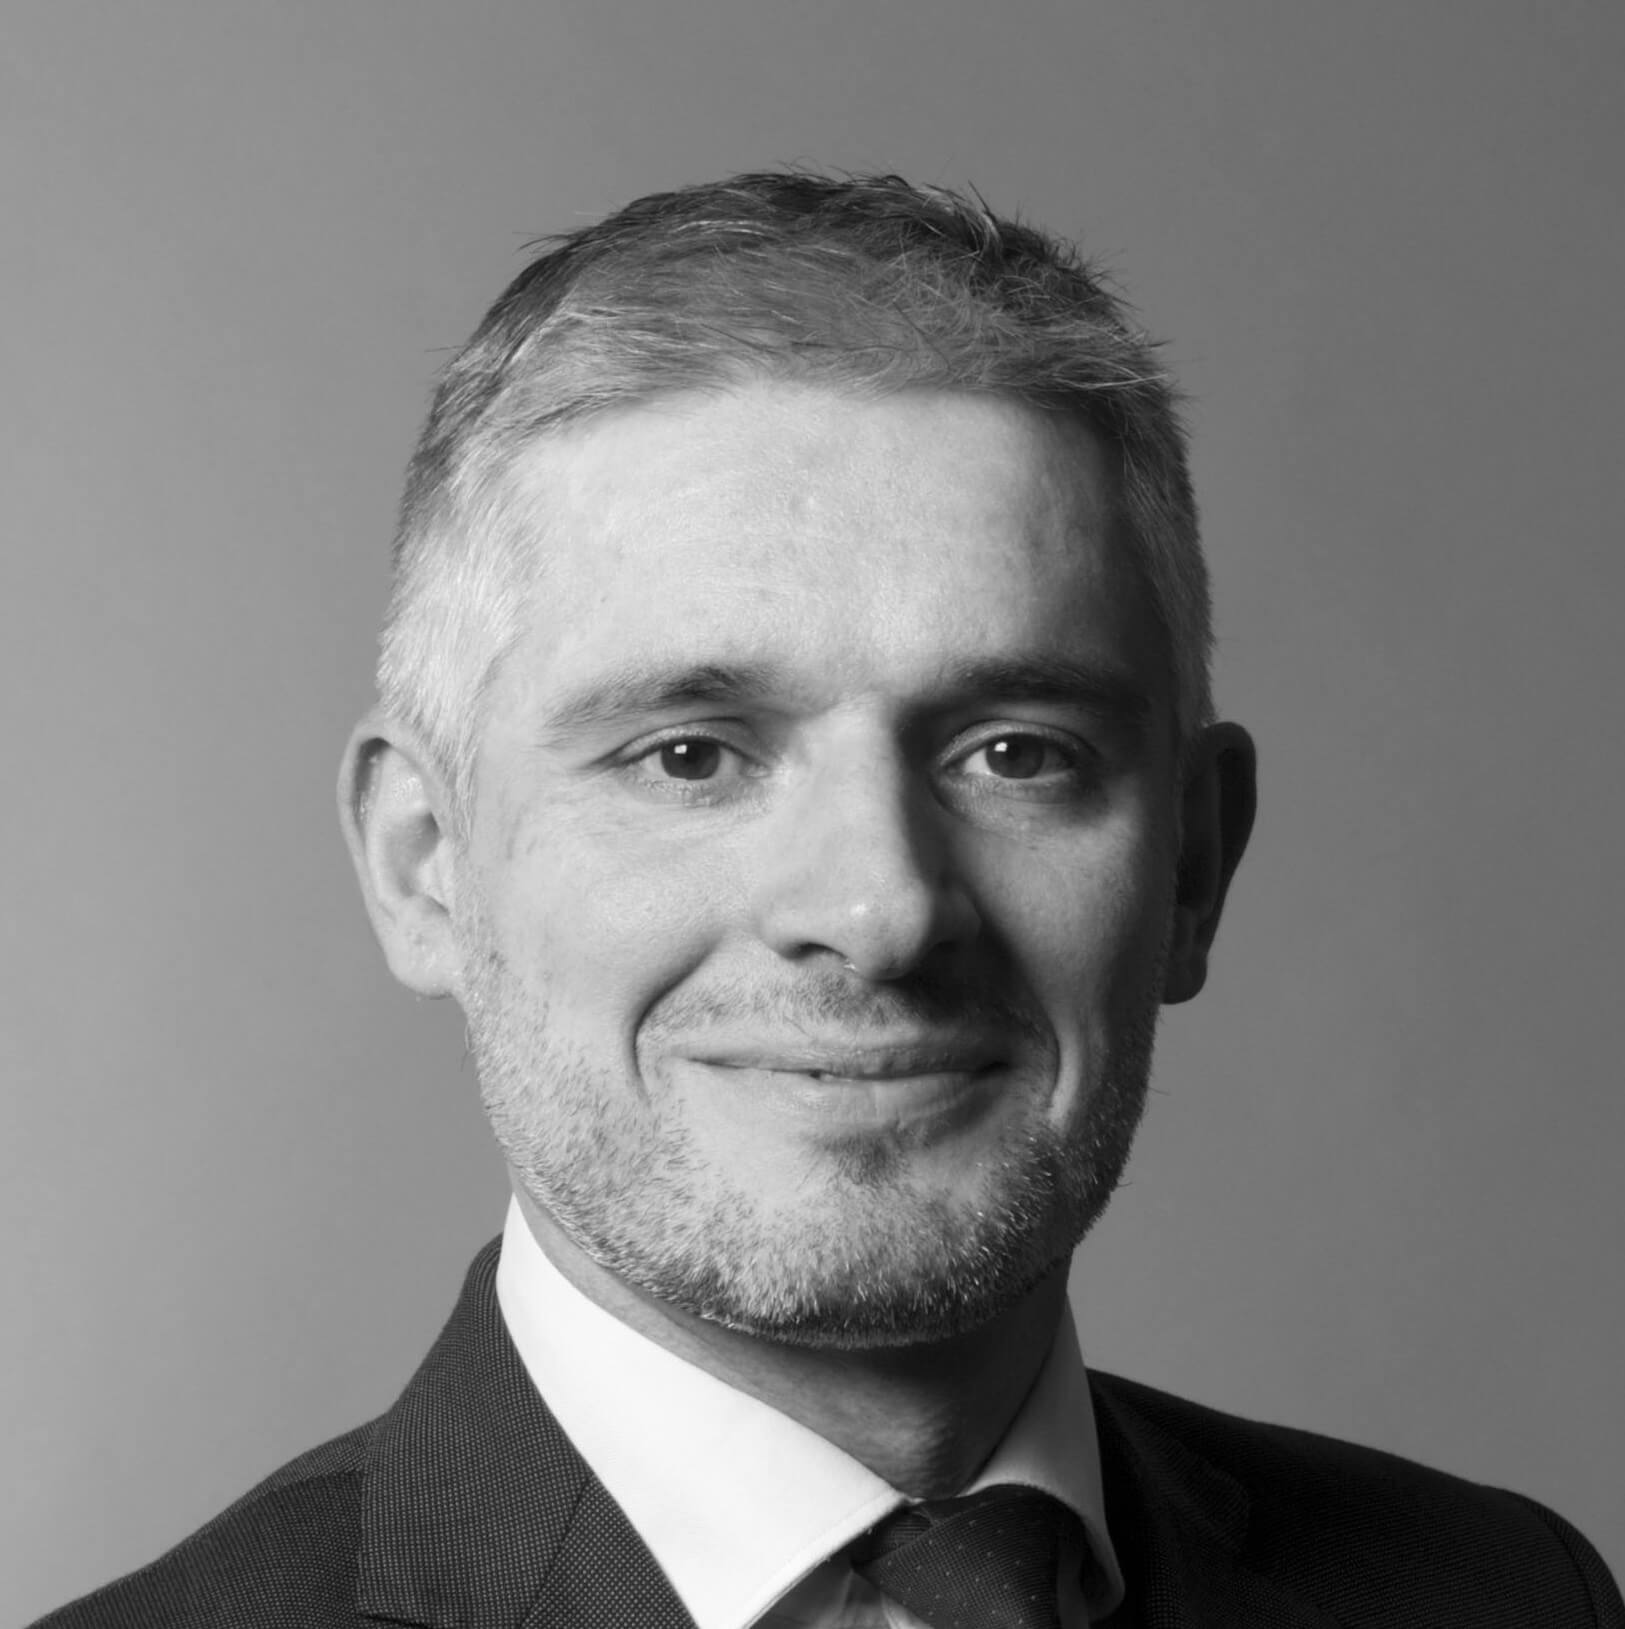 Sébastien Ledent